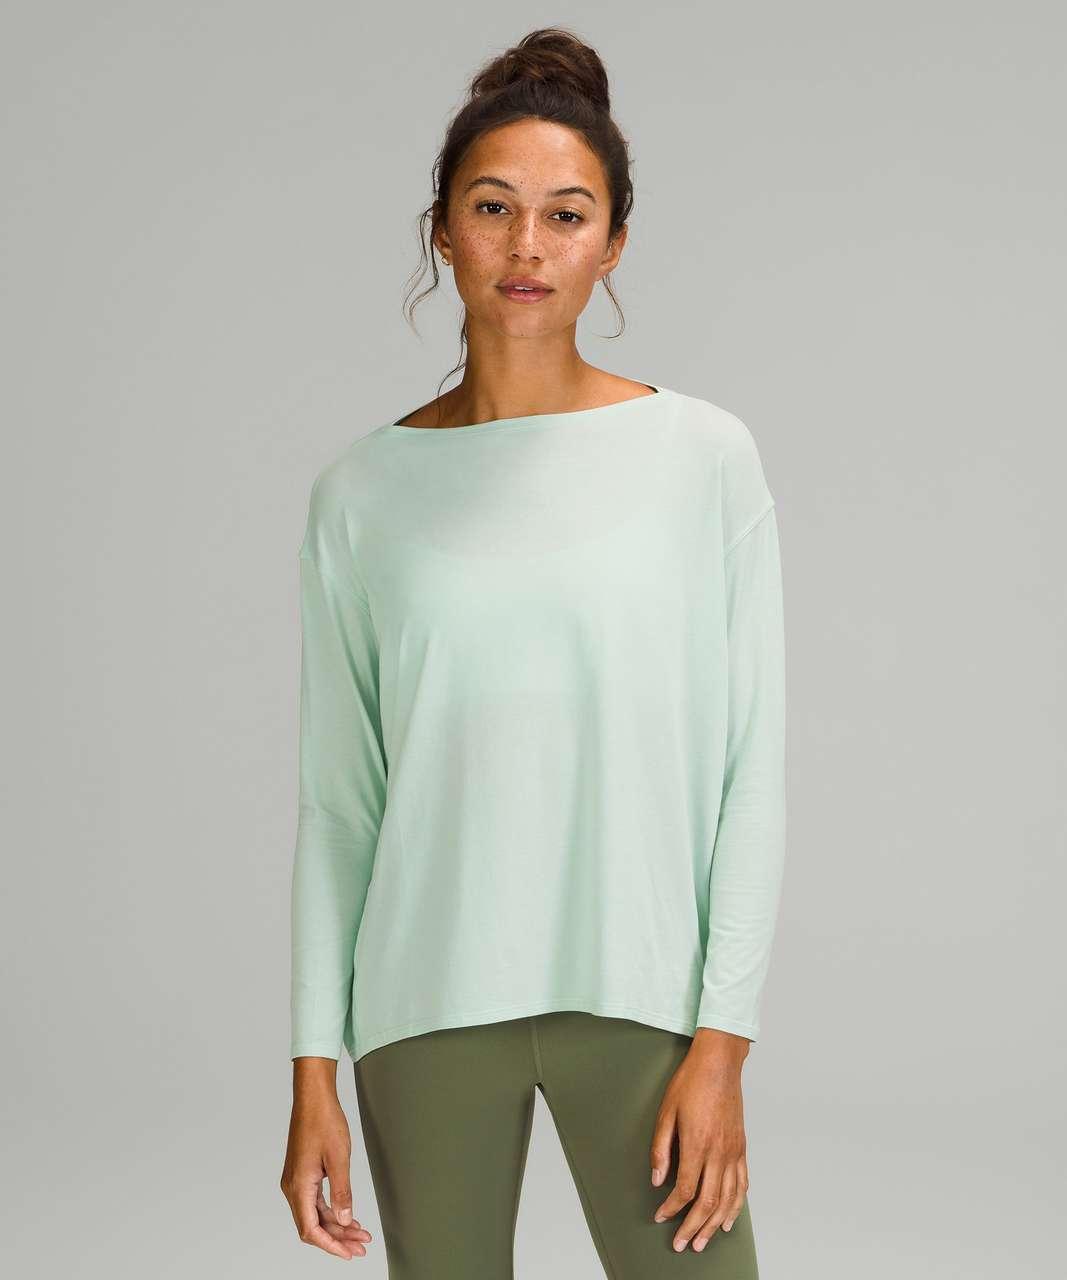 Lululemon Back In Action Long Sleeve Shirt - Delicate Mint